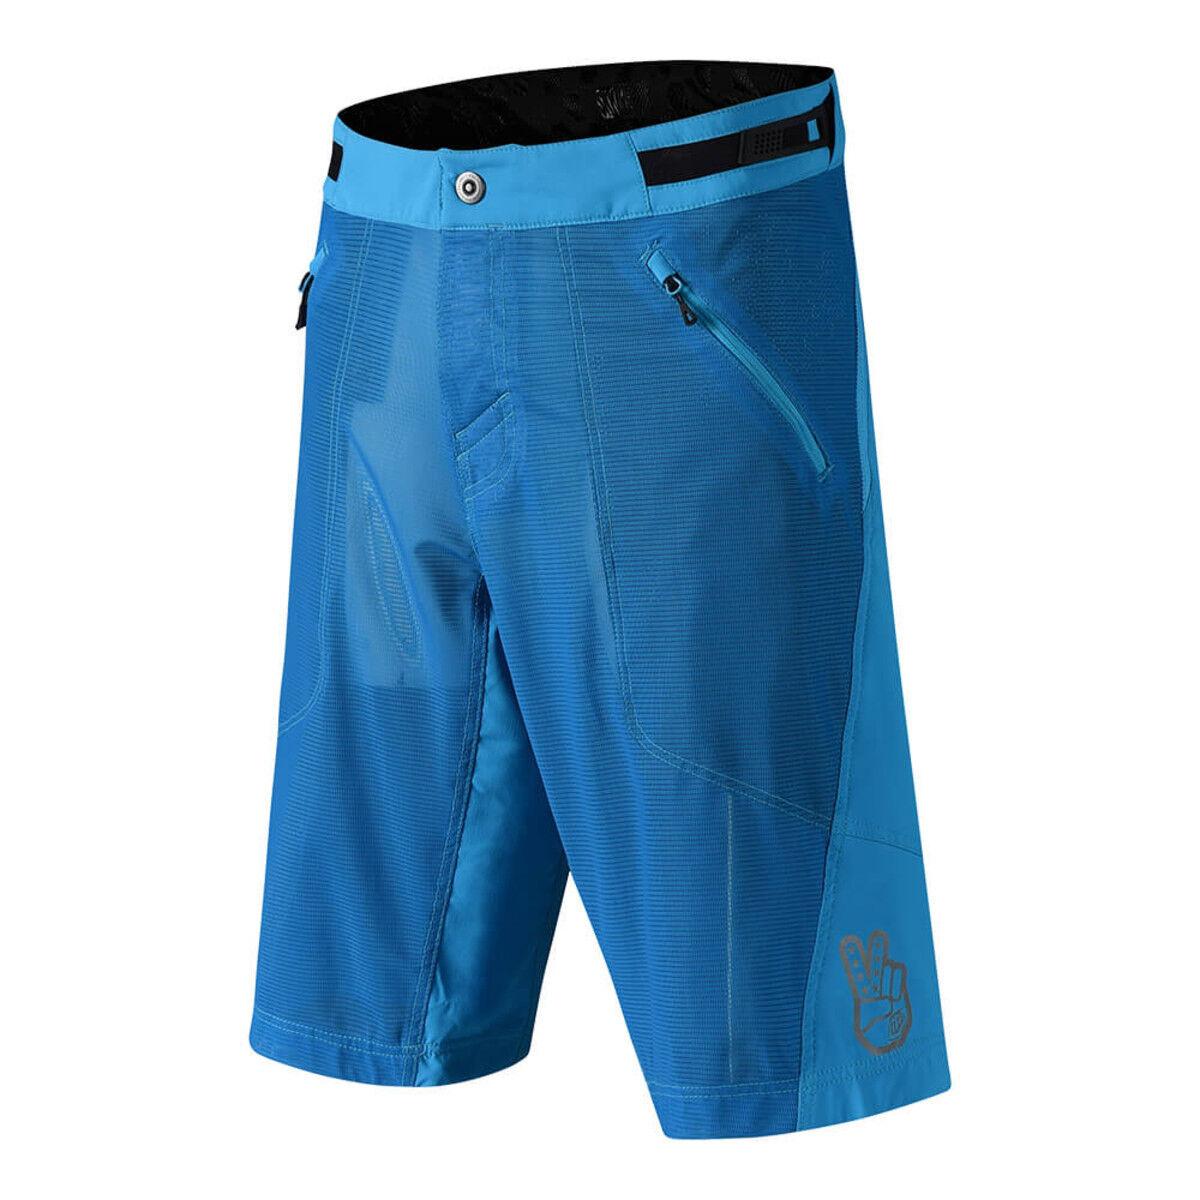 Troy Lee Designs Mountain Bike Shorts  SKYLINE AIR SHORT; OCEAN 36  cheap store